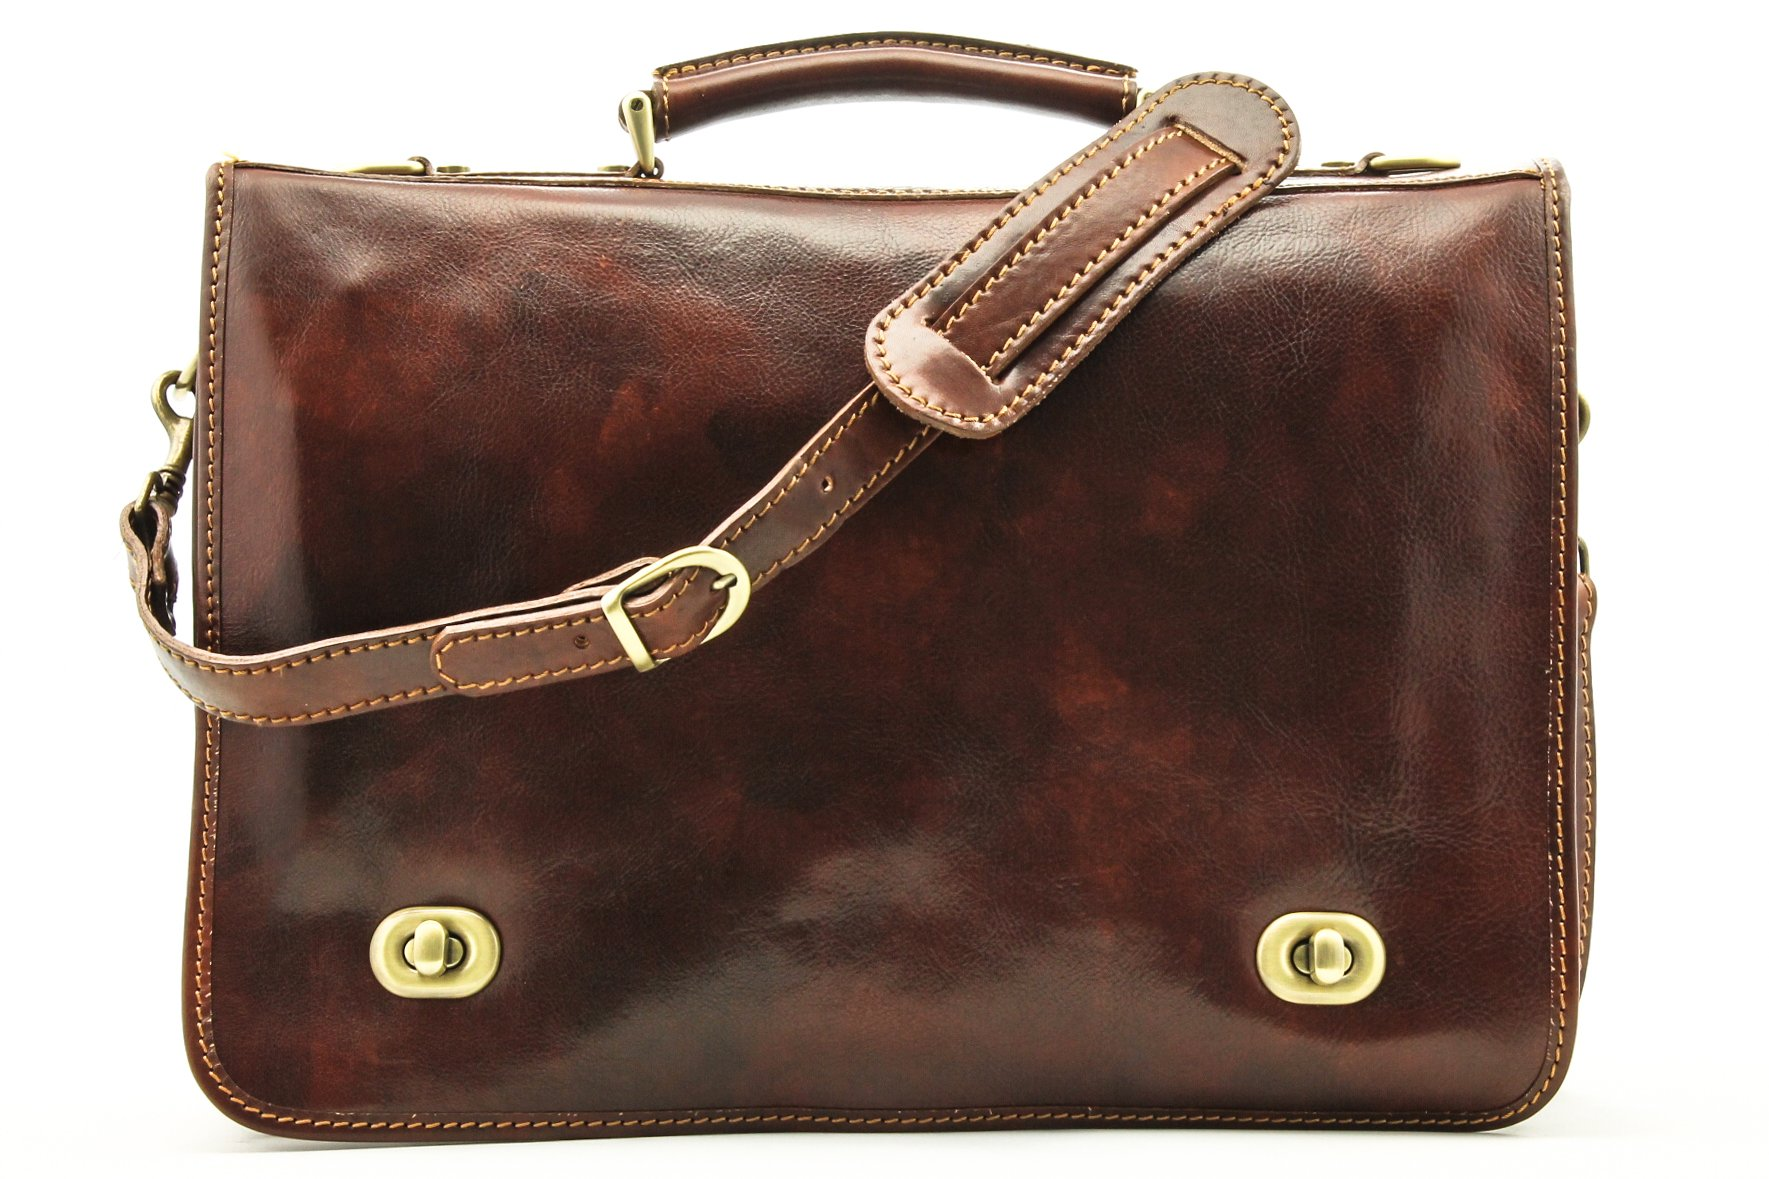 Alberto Bellucci Mens Italian Leather Nevio Double Compartment Laptop Messenger Bag in Brown